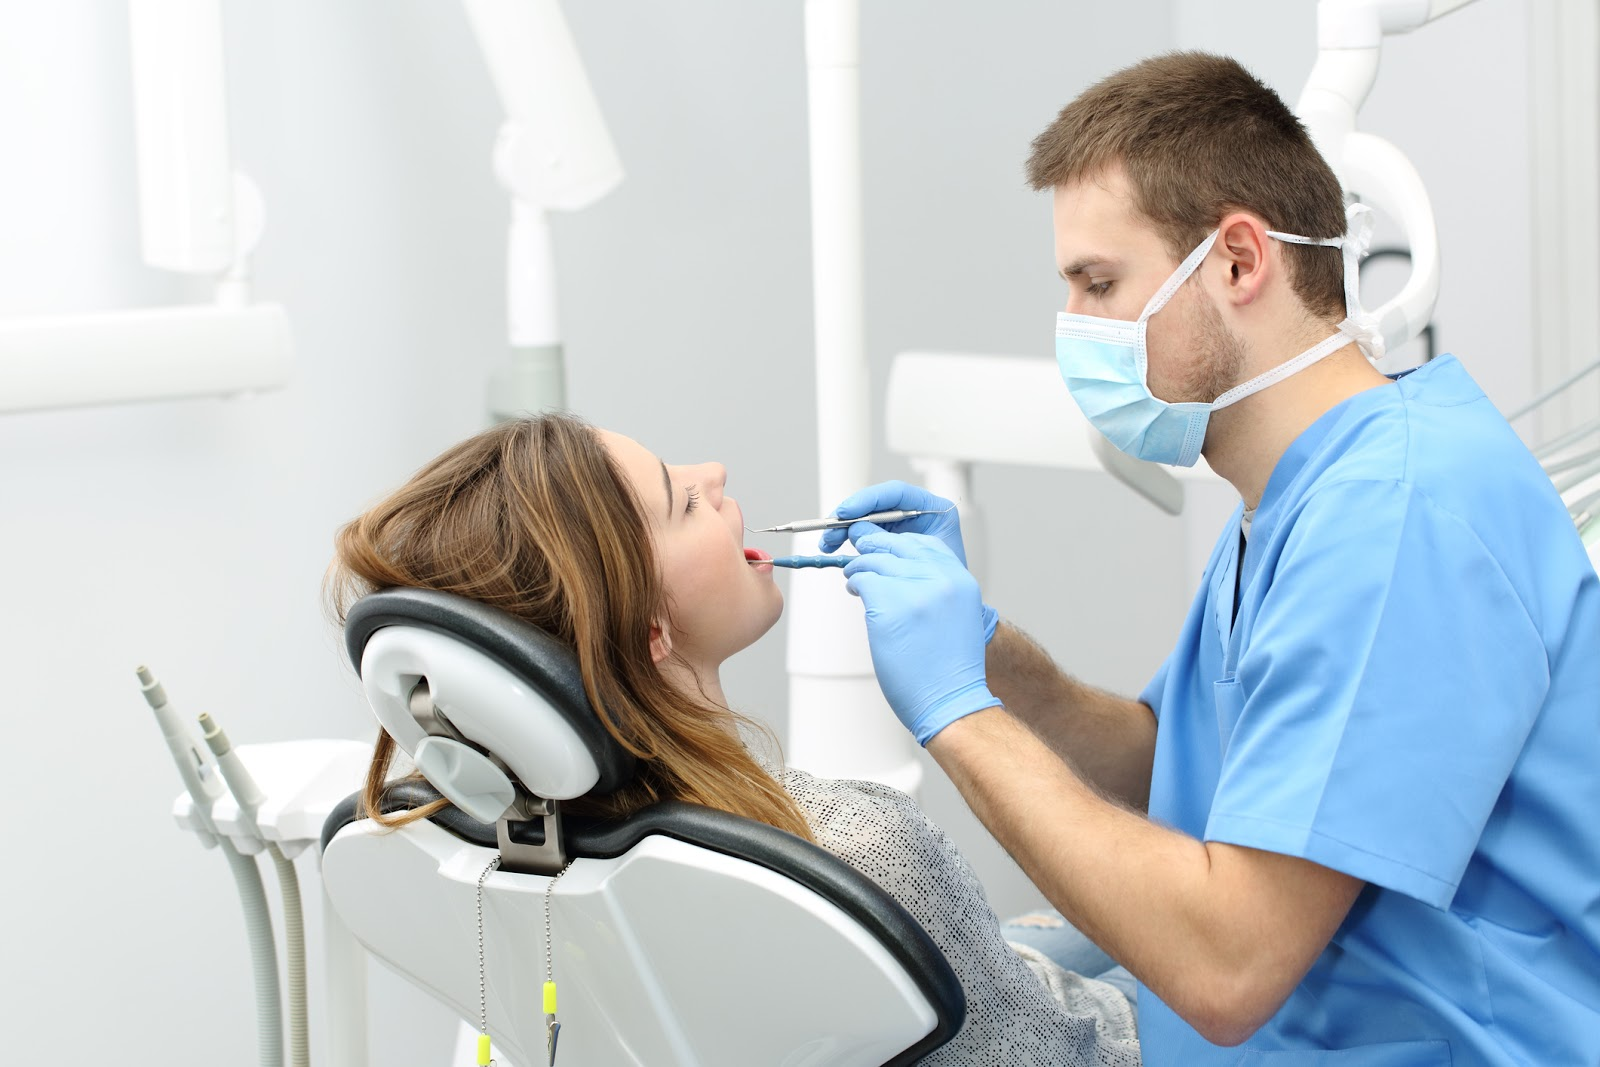 mobilità dentale cura